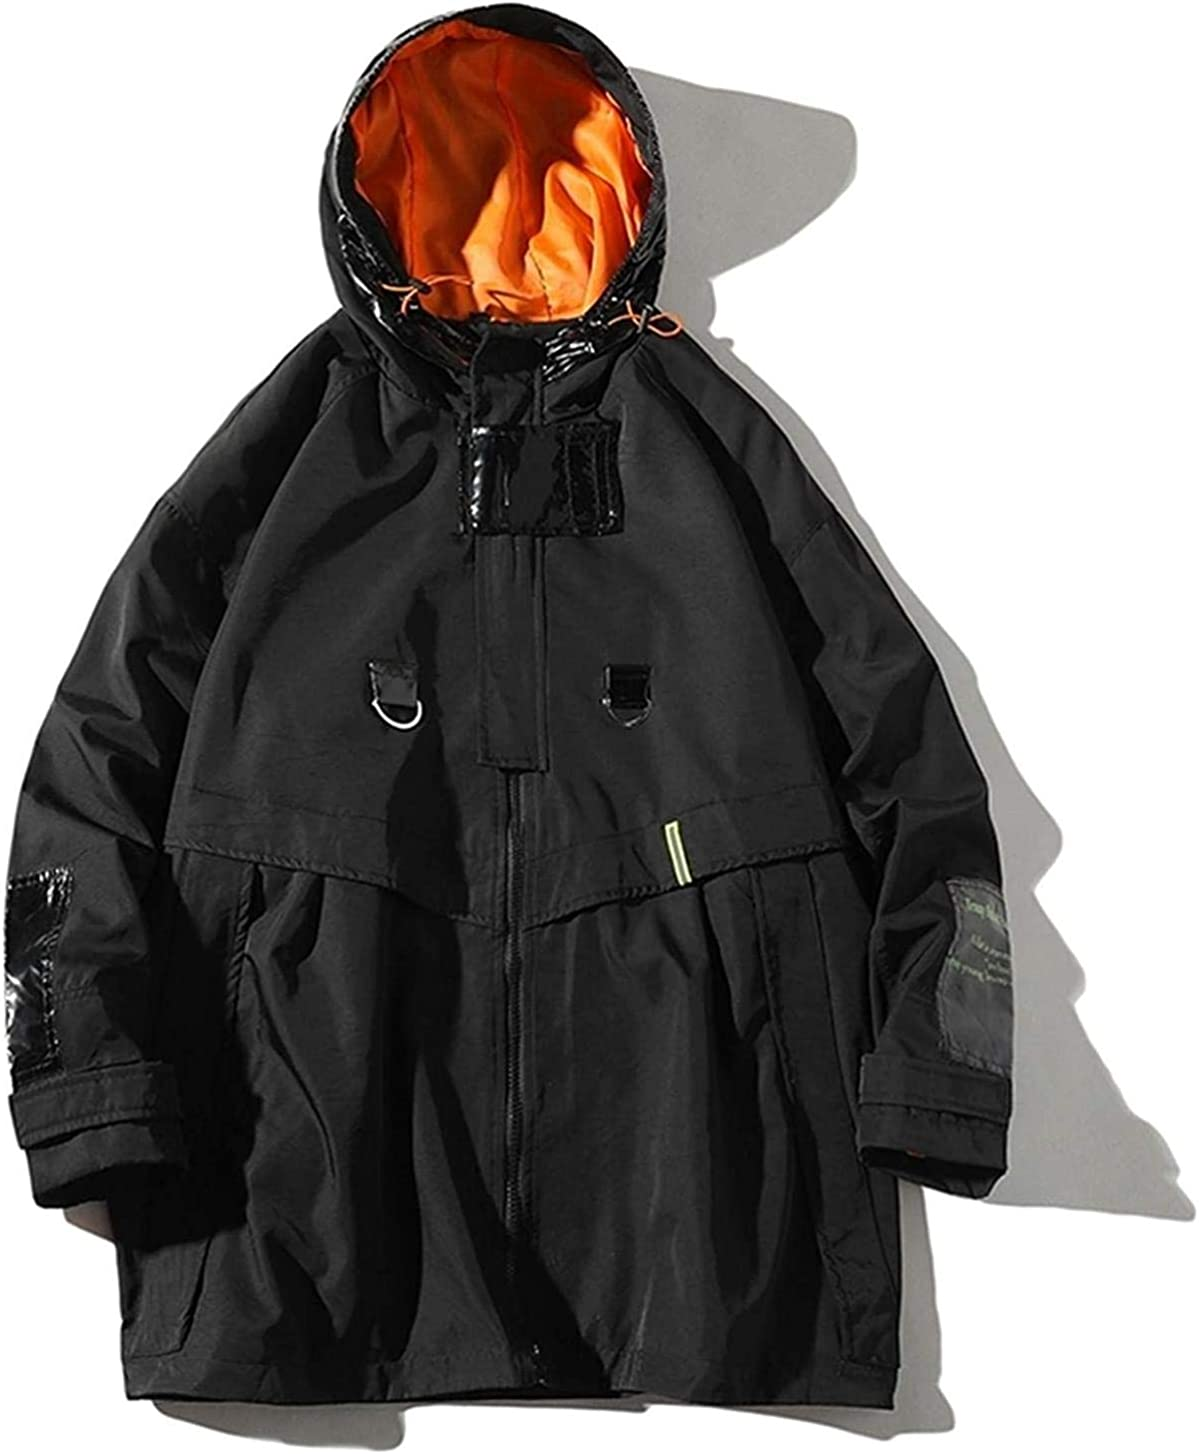 Streetwear Trench Coat Men Autumn Windbreaker Mens Hooded Jackets Coats Harajuku Vintage Patchwork Windbreaker